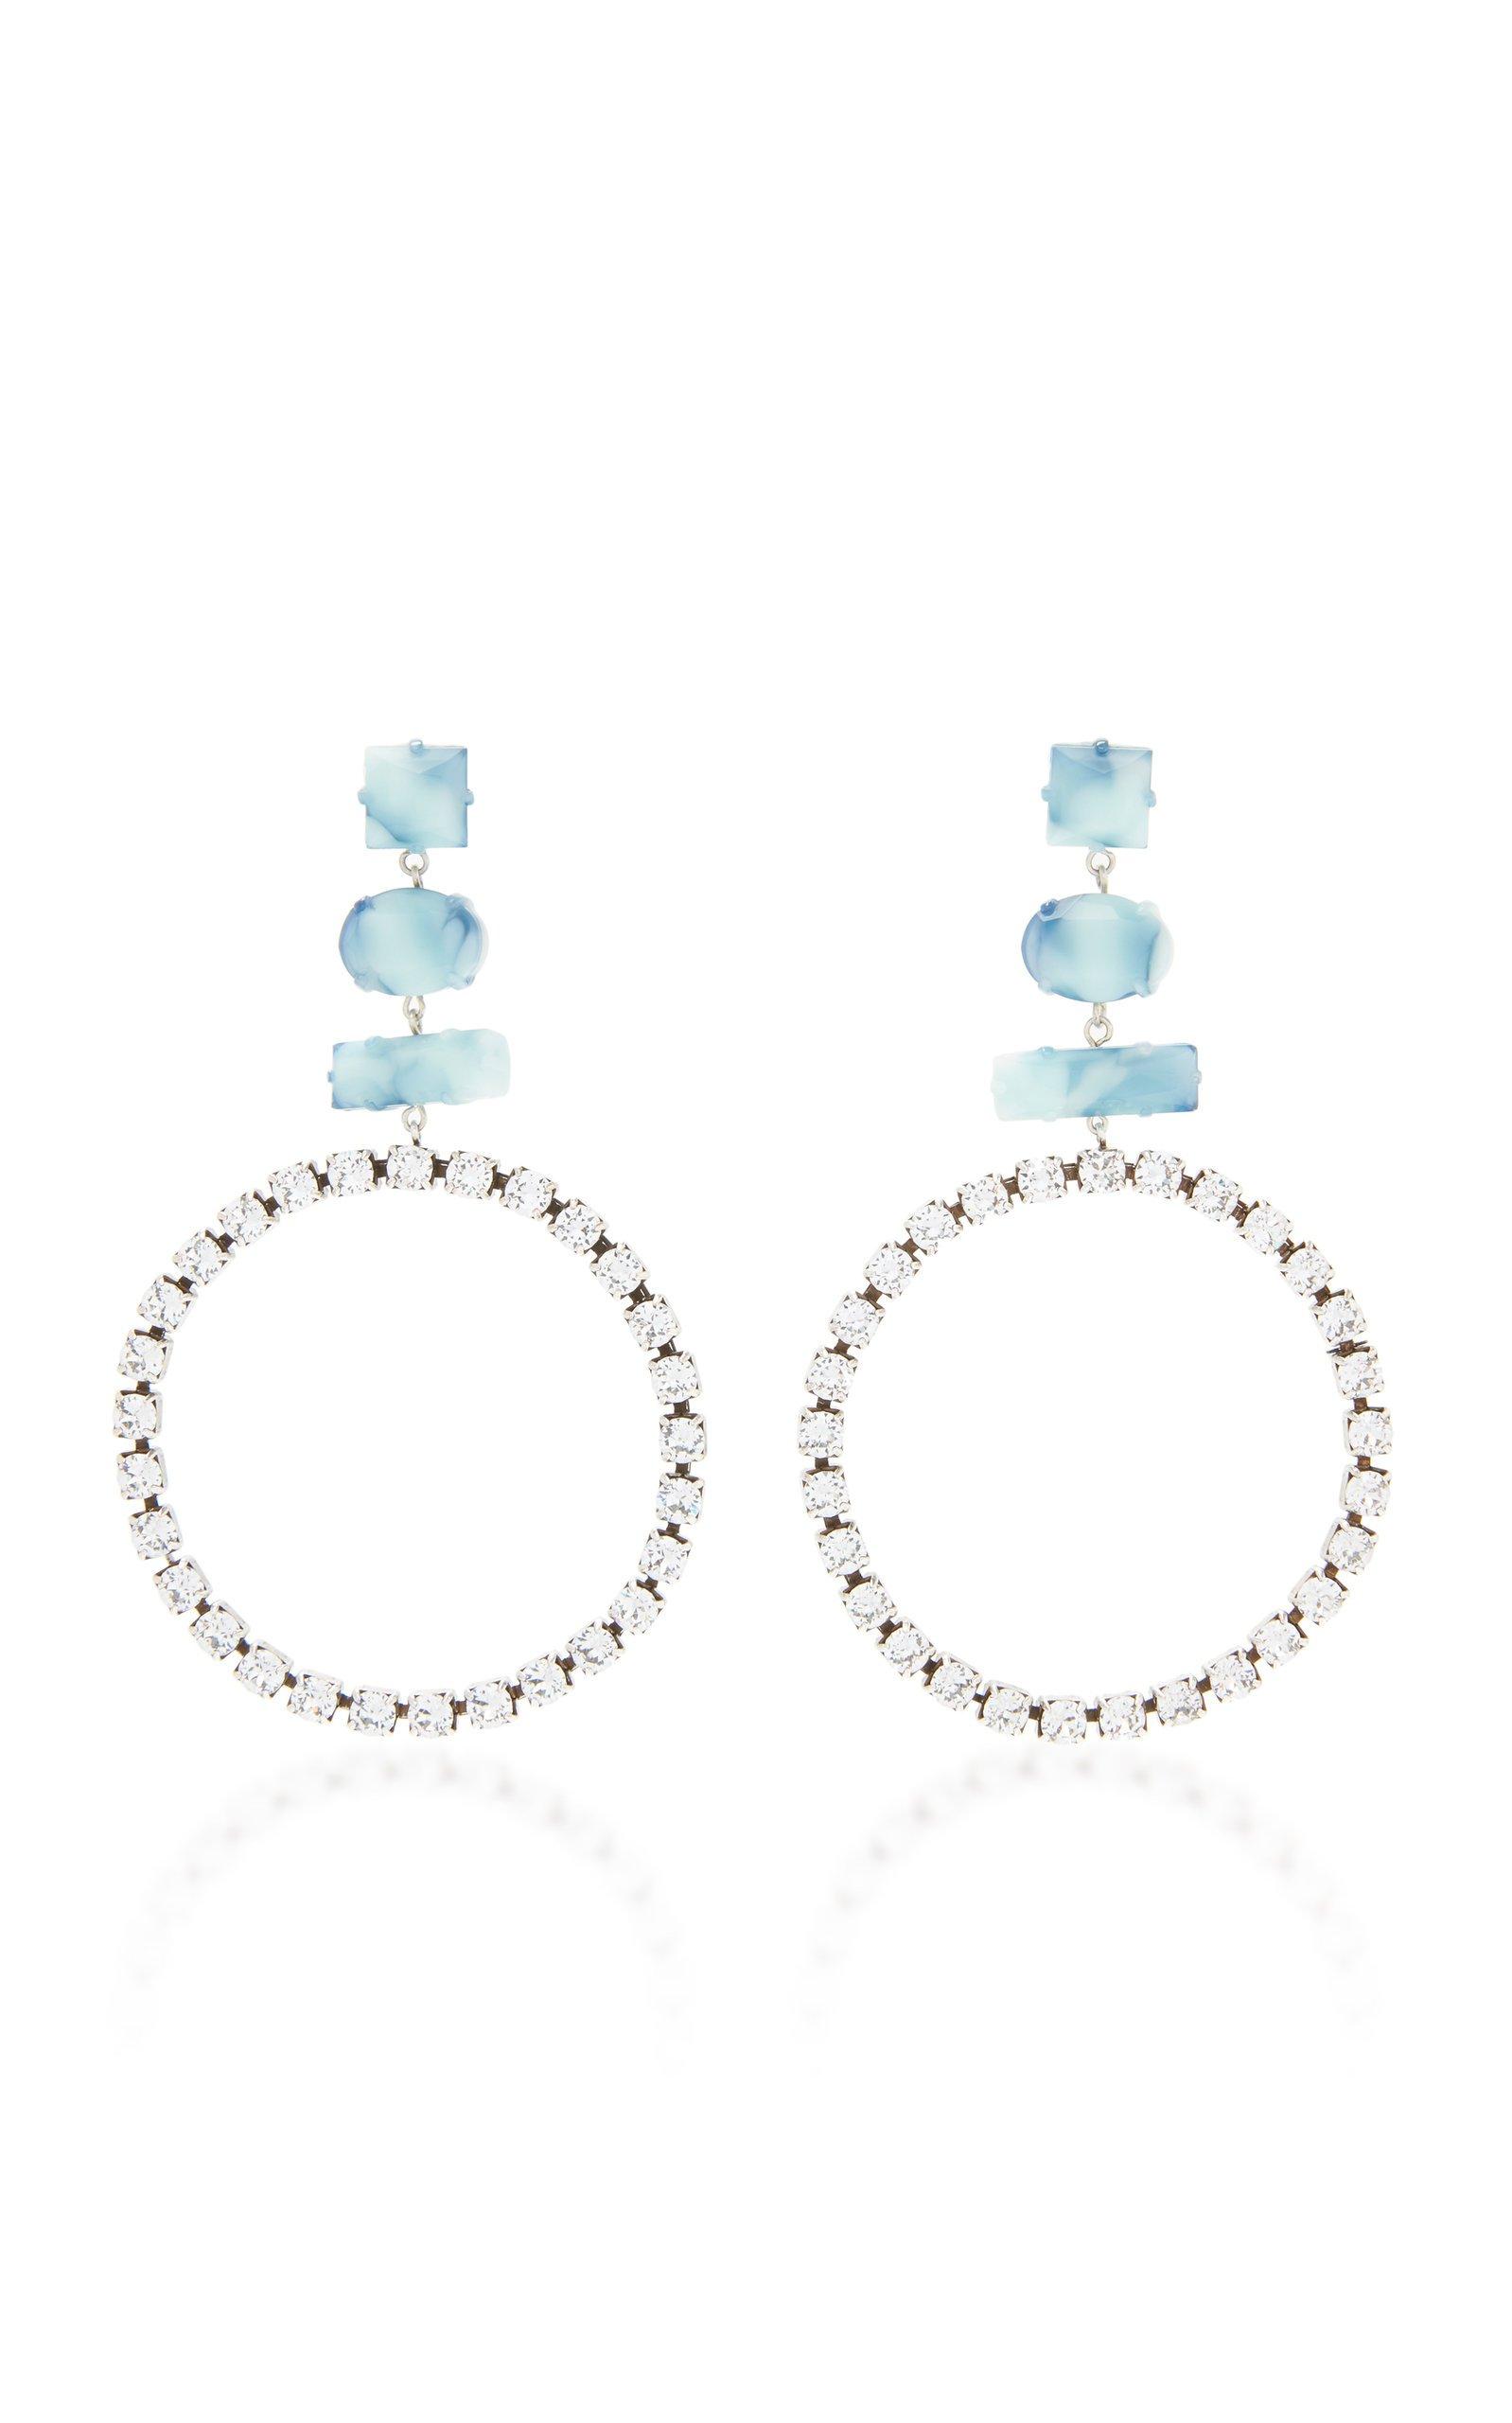 Silver-Tone, Swarovski Crystal And Resin Earrings by Isabel Marant | Moda Operandi